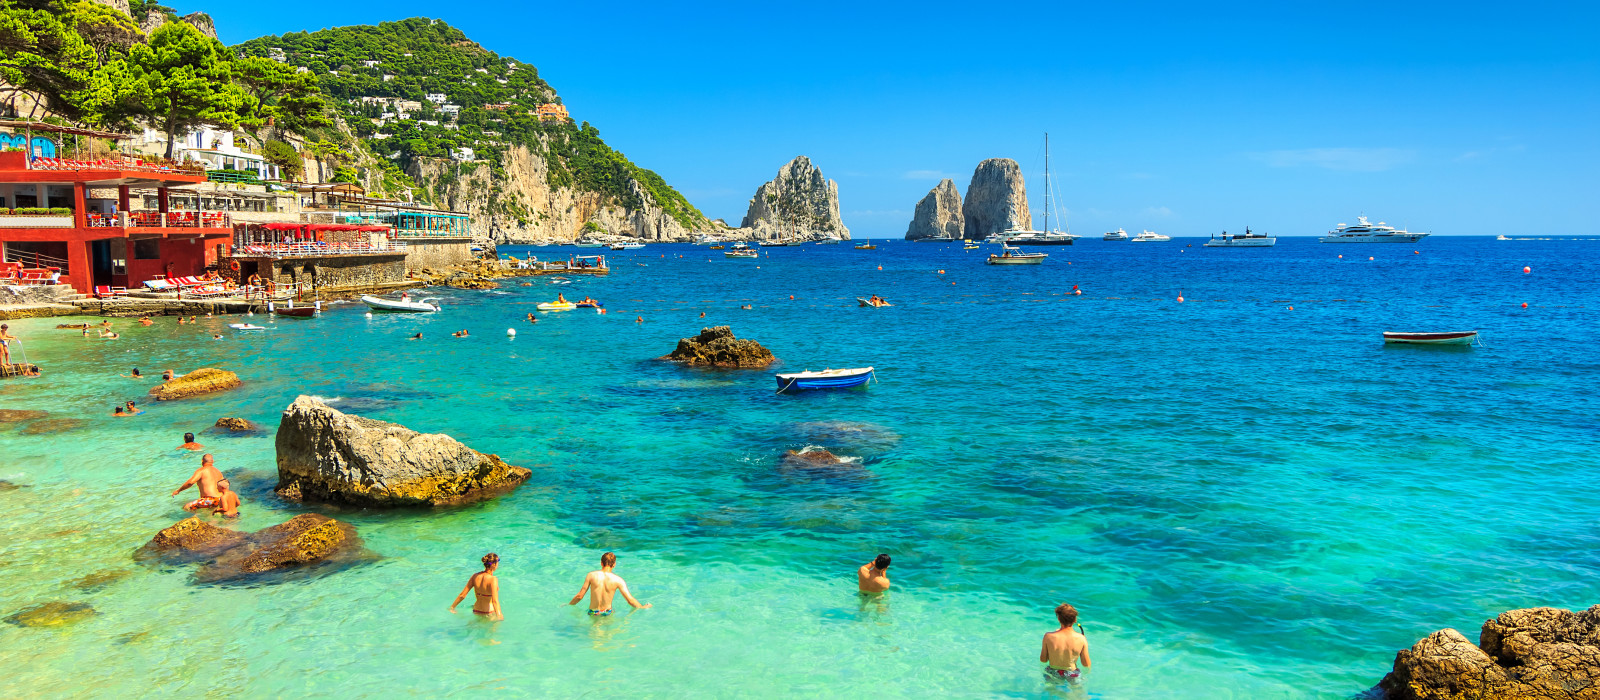 Destination Capri Italy